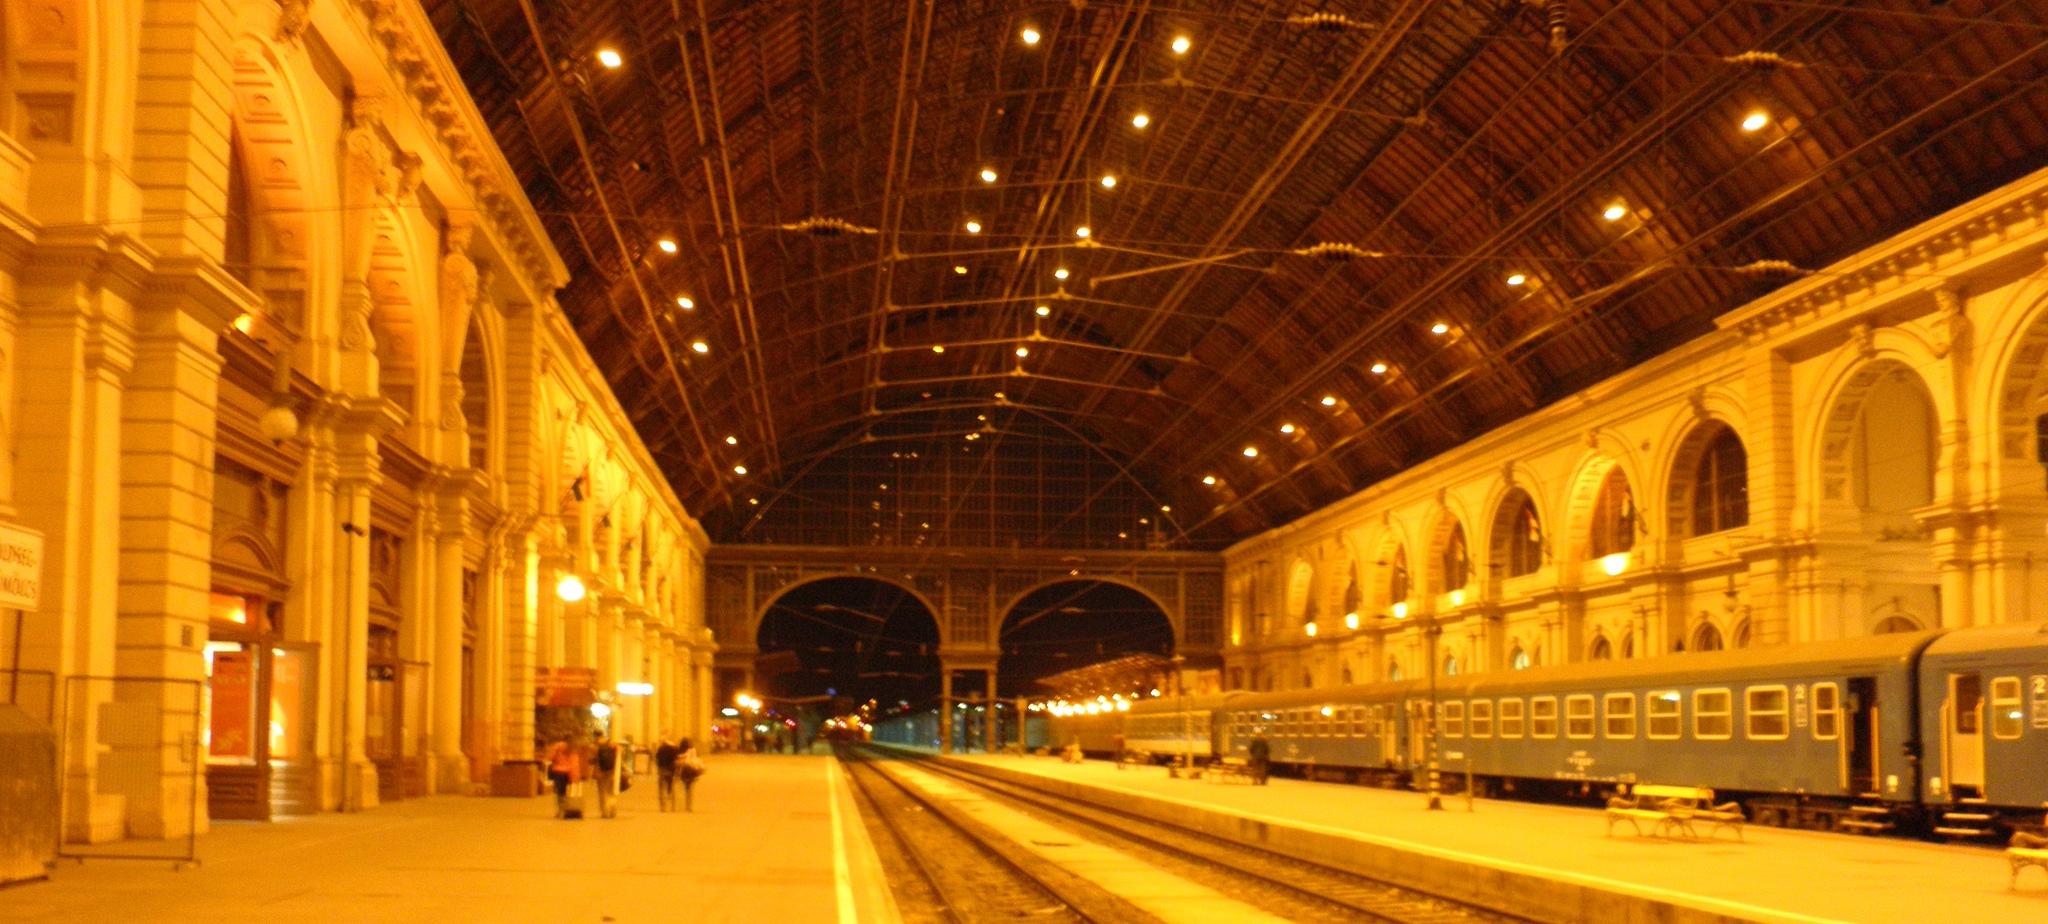 Het prachtige Budapest Keleti station ©Frantisek Trampota